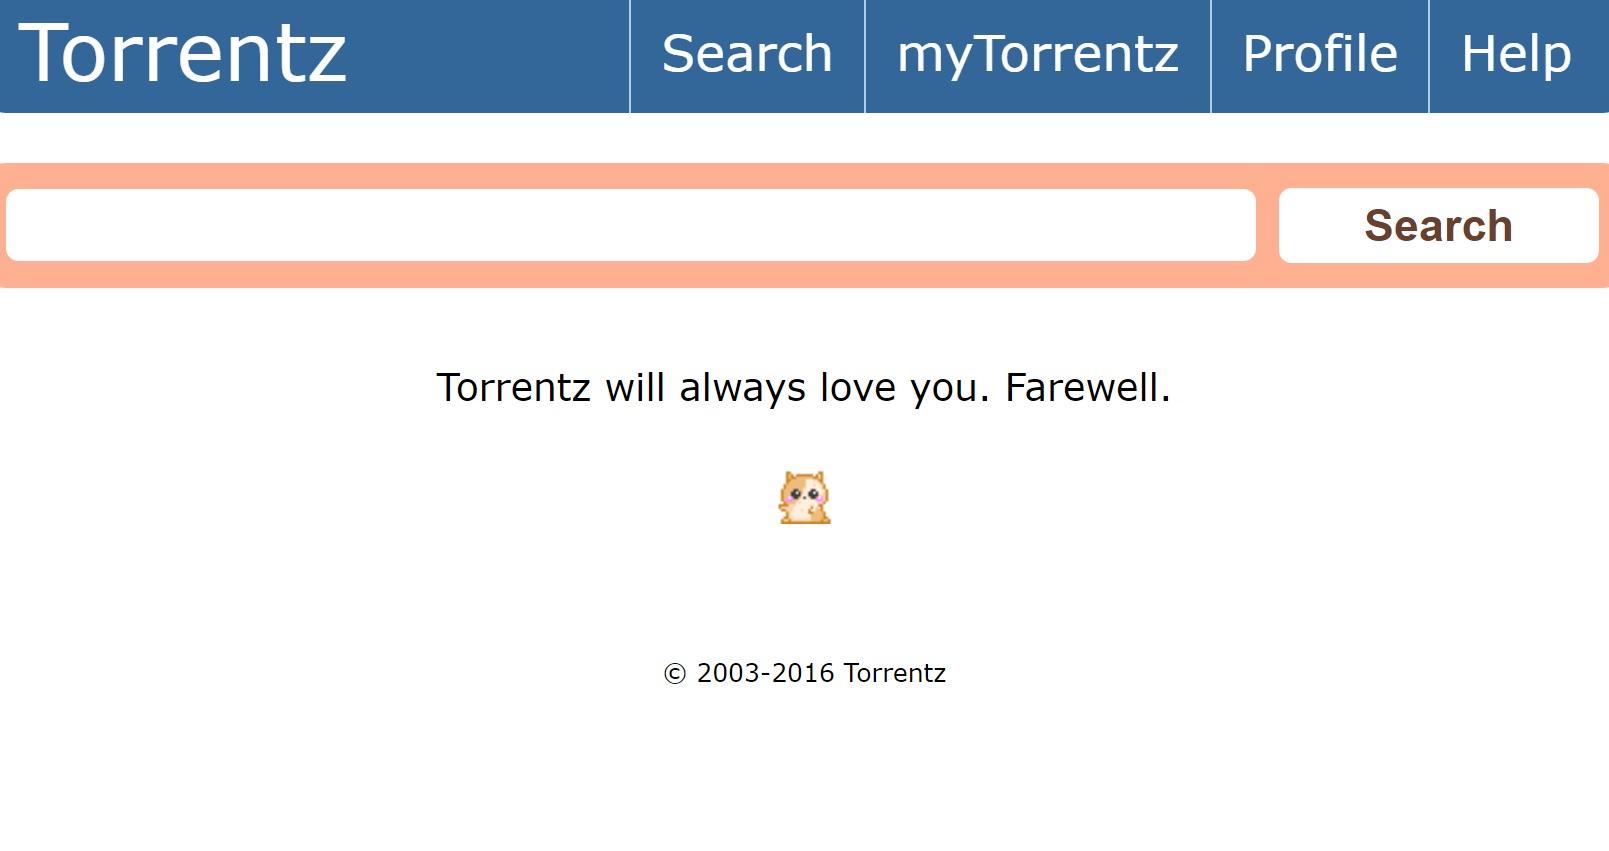 Torrentz